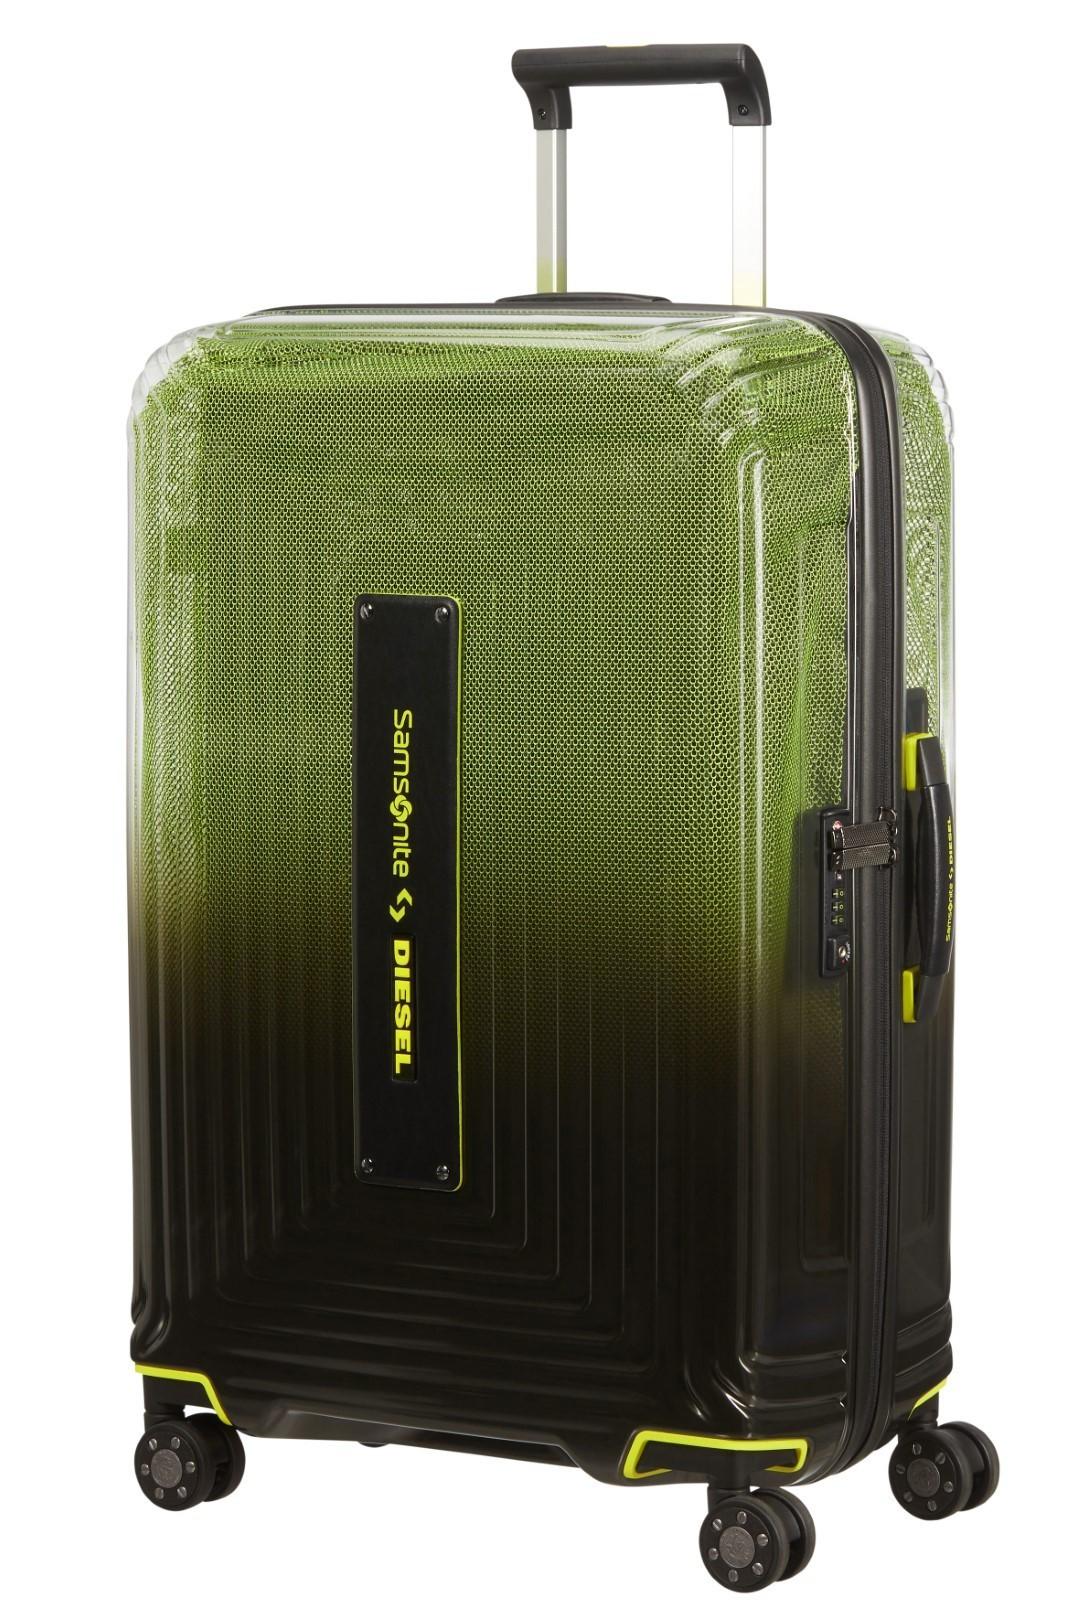 Samsonite Neopulse x Diesel Spinner 69/25 Black/Yellow